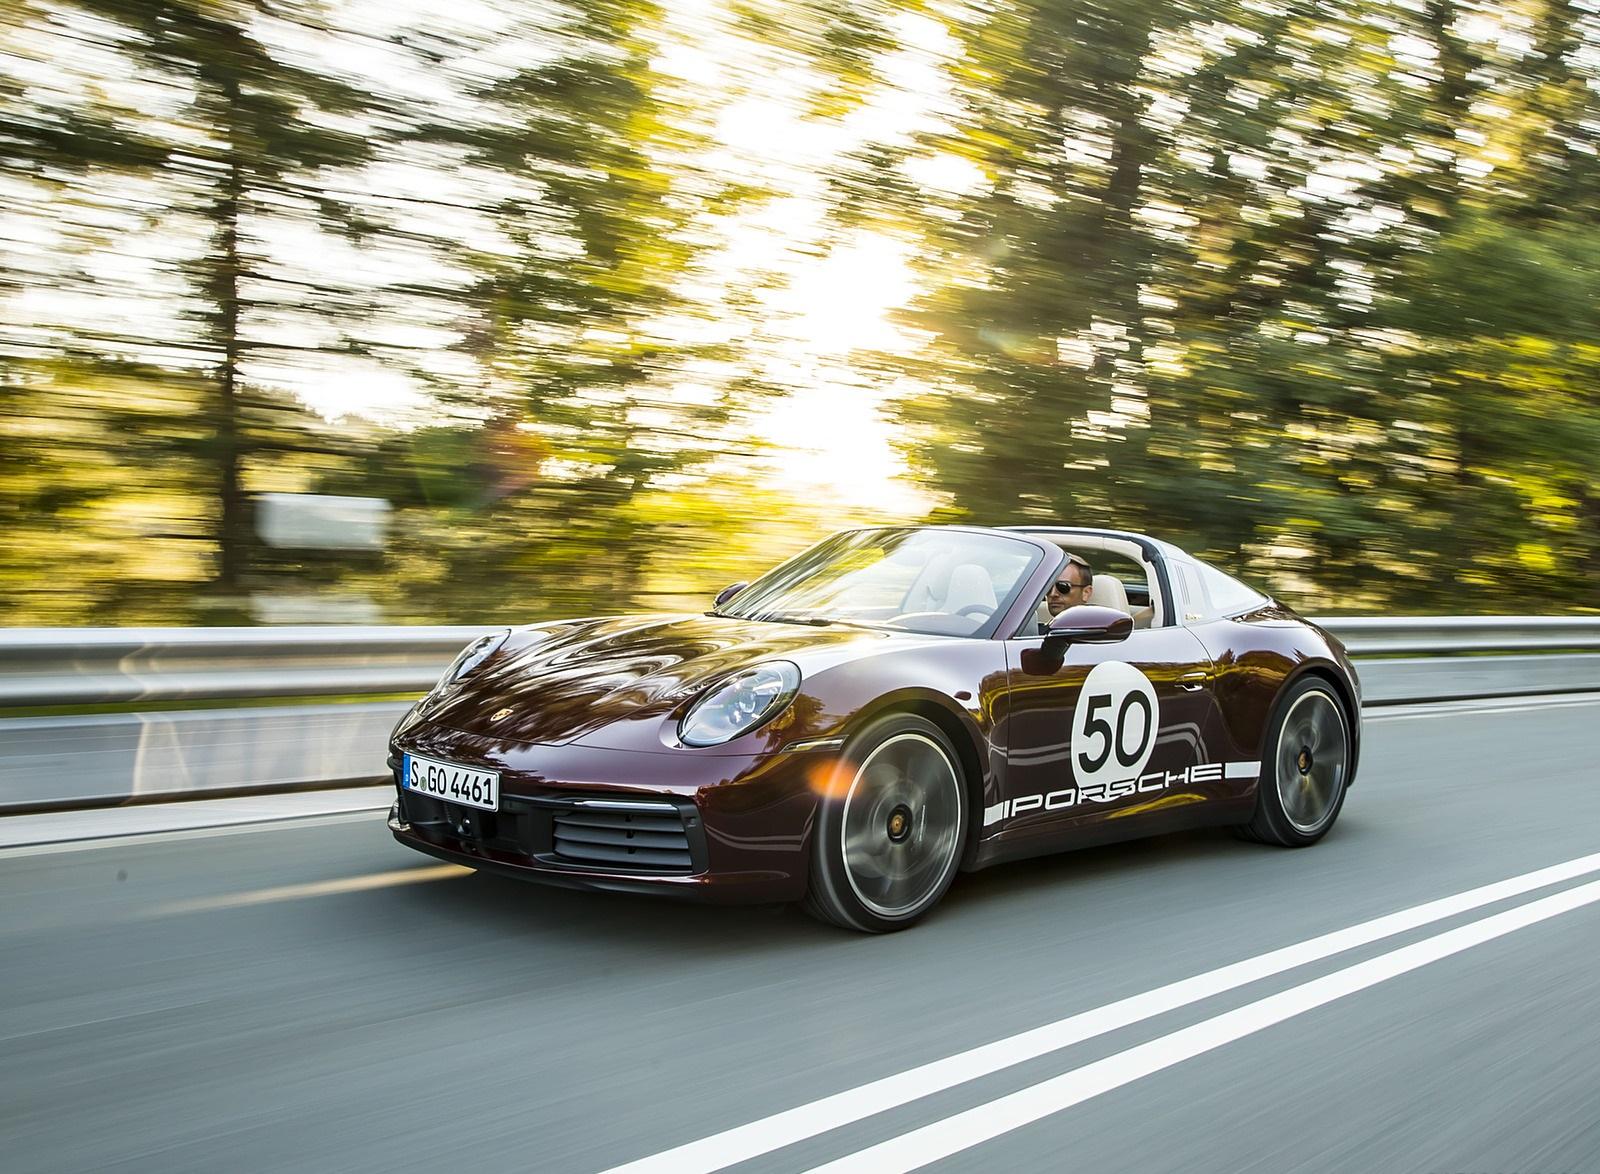 2021 Porsche 911 Targa 4S Heritage Design Edition (Color: Cherry Metallic) Front Three-Quarter Wallpapers (8)